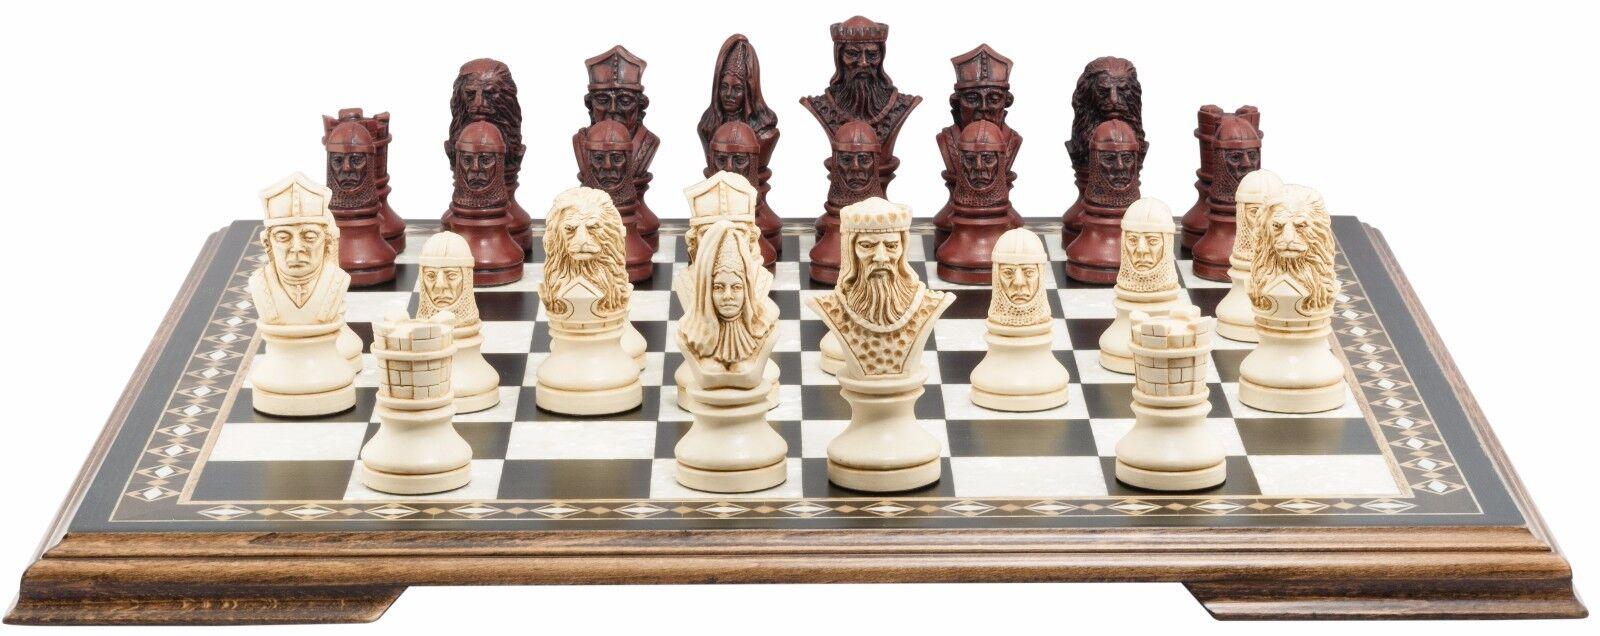 Studio Anne voiturelton Chess Richard the Lionheart   pas cher en ligne